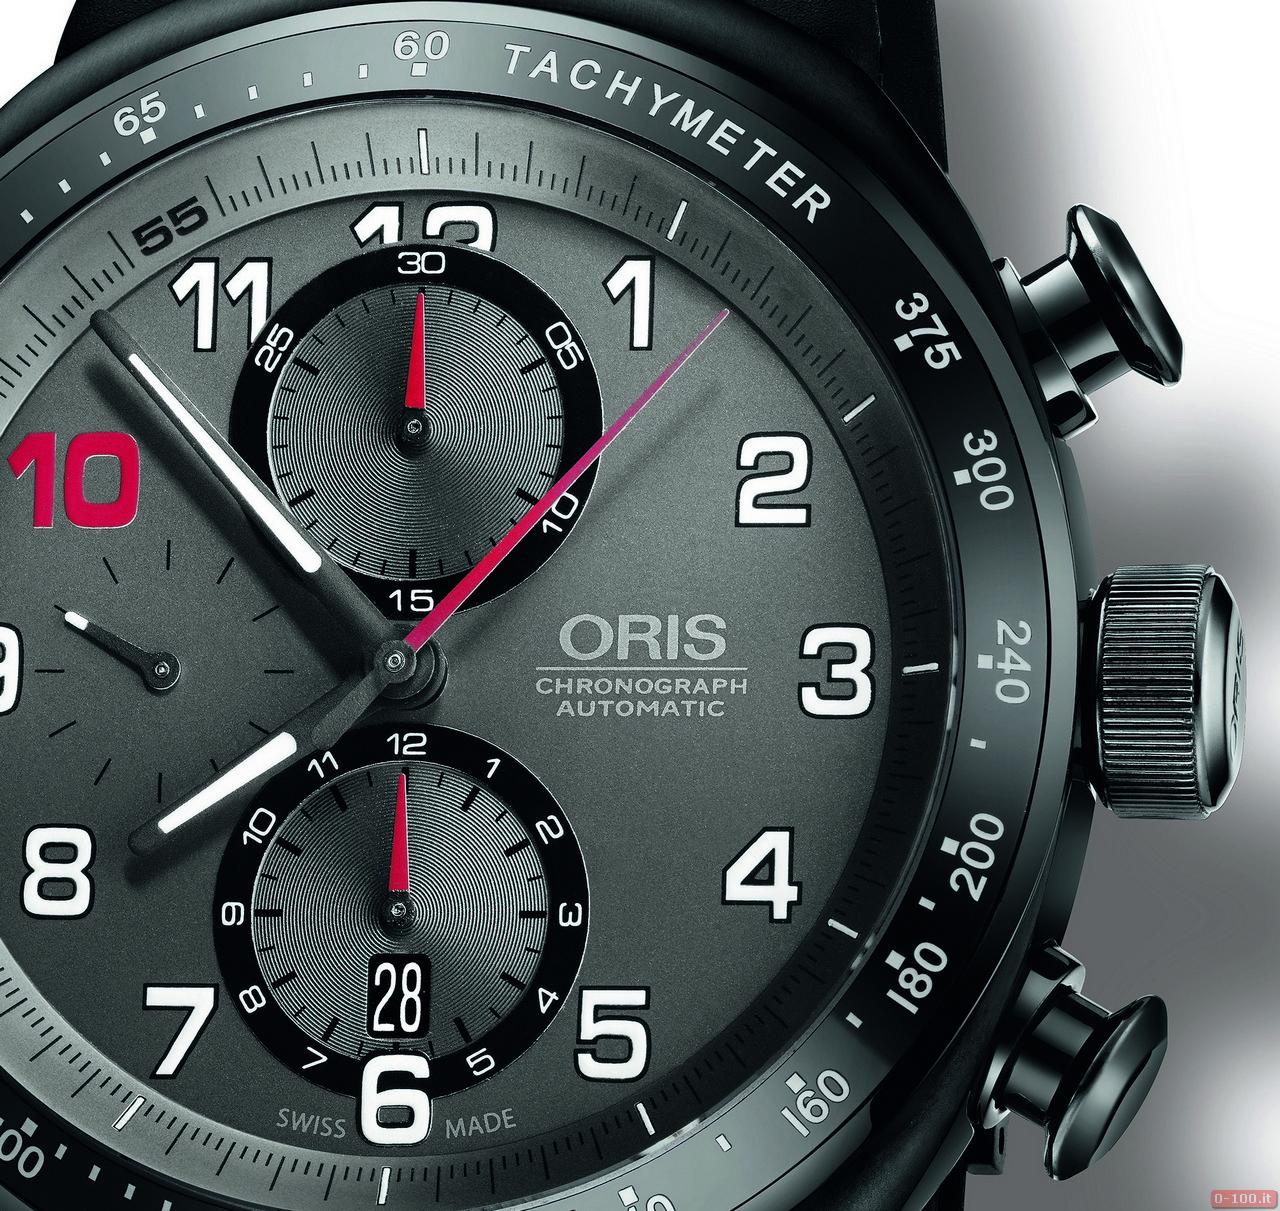 anteprima-baselworld-2014-oris-darryl-oyoung-limited-edition-prezzo-price_0-1001